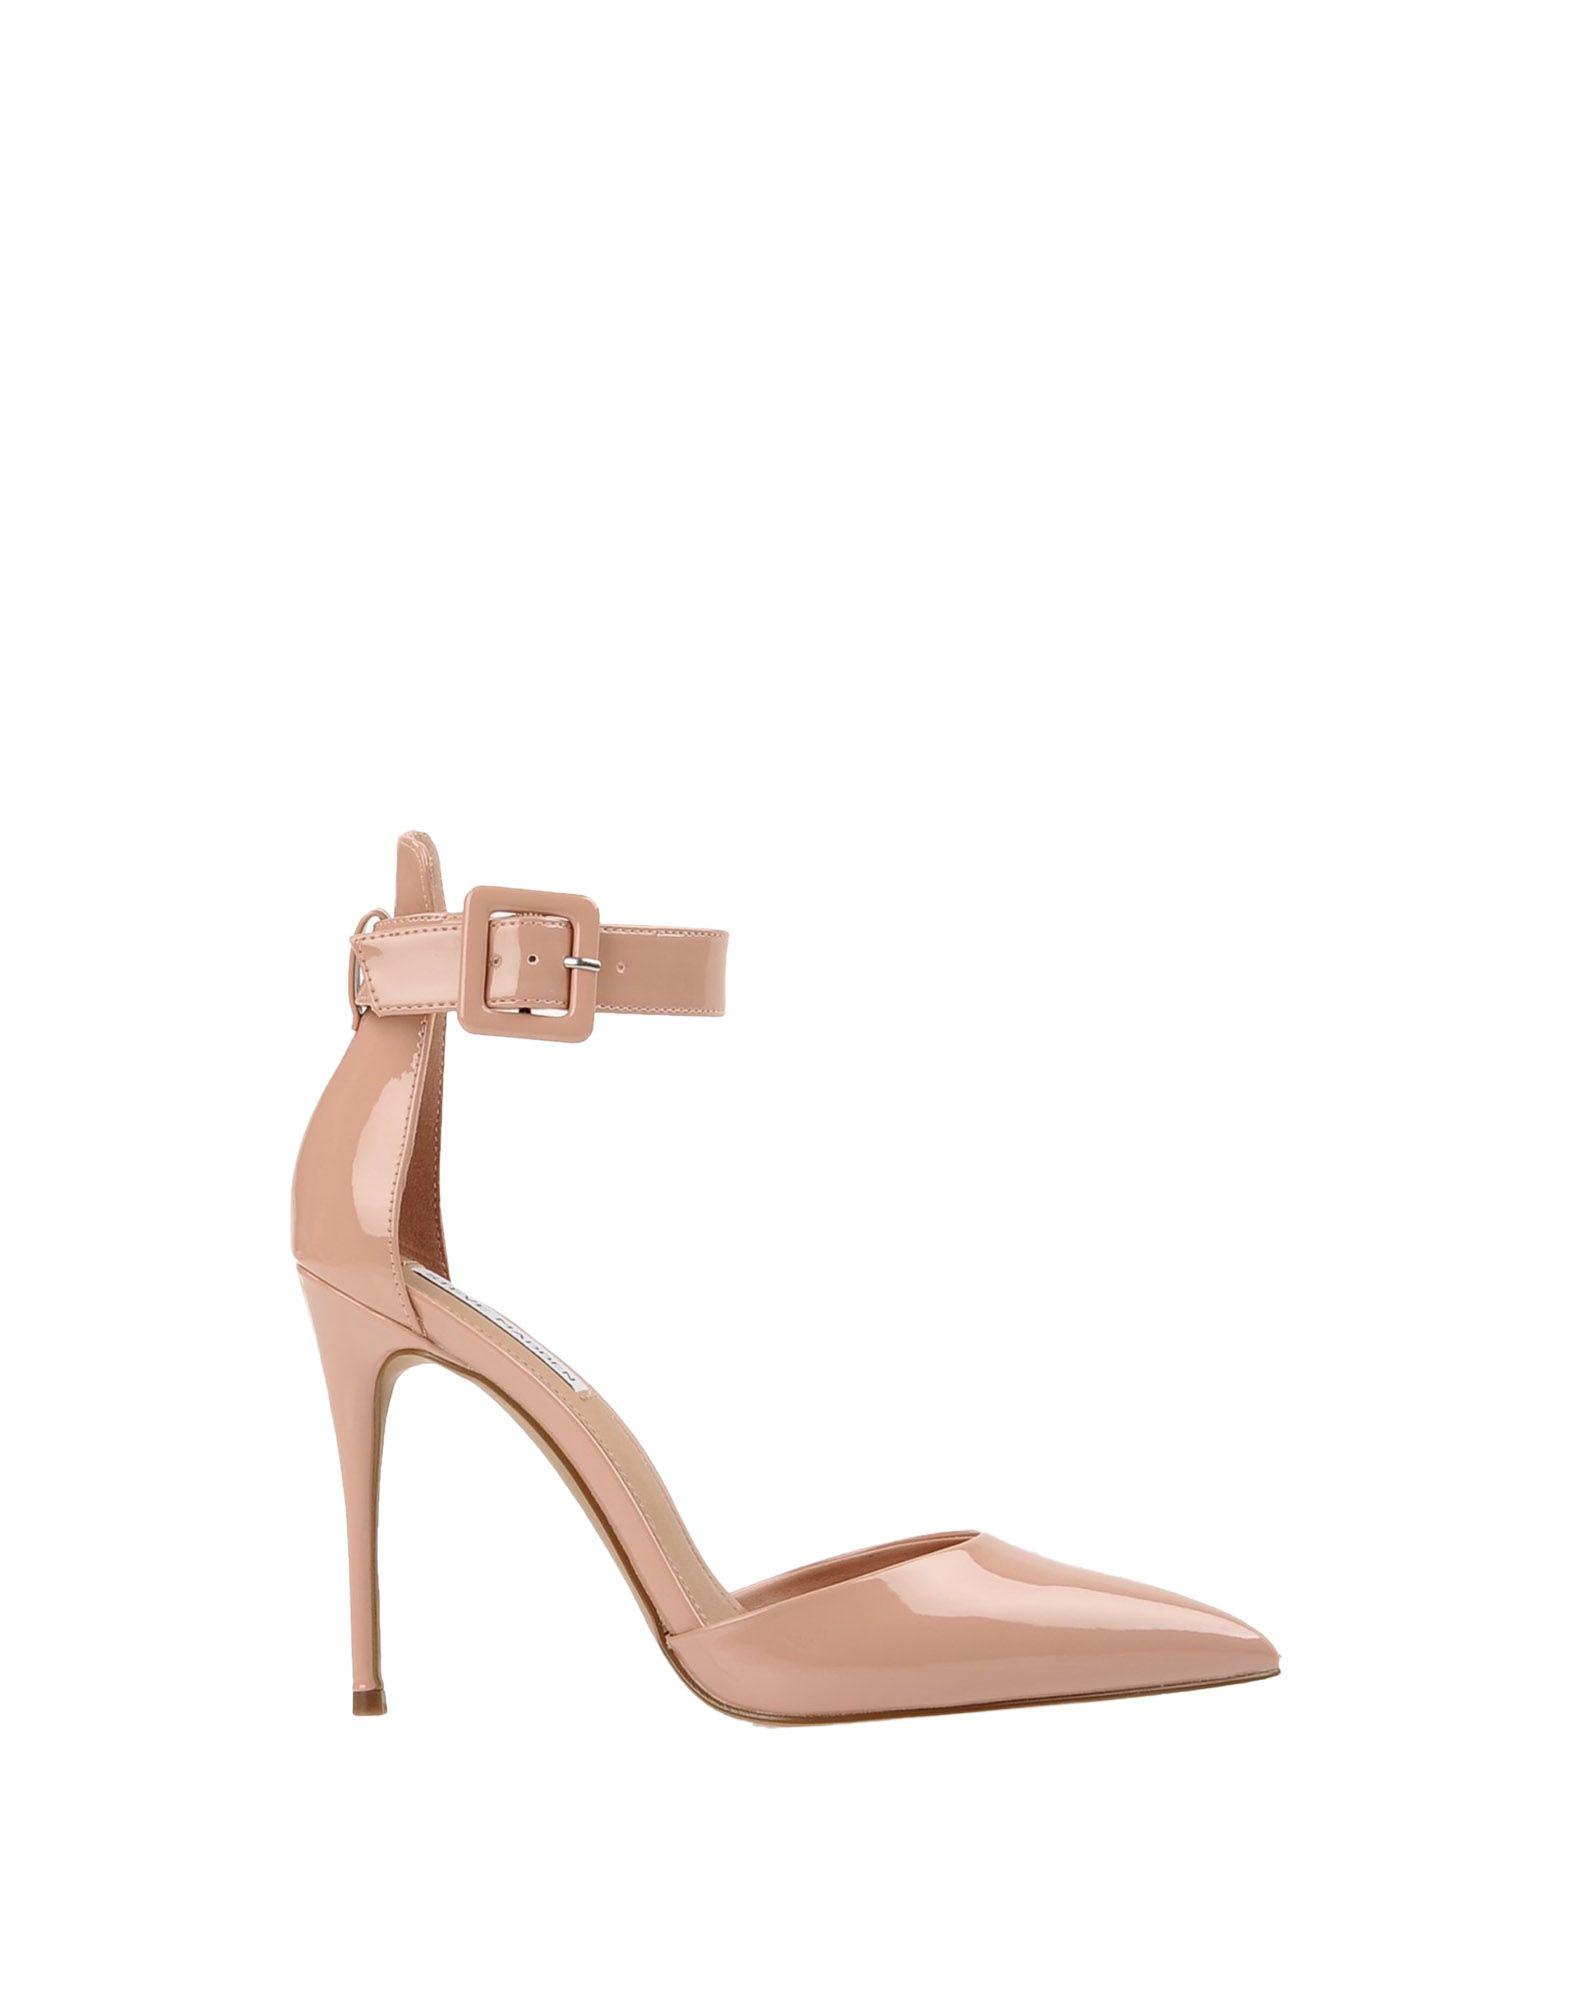 Escarpins Steve Madden Desire High Heel Sandal - Femme - Escarpins Steve Madden sur